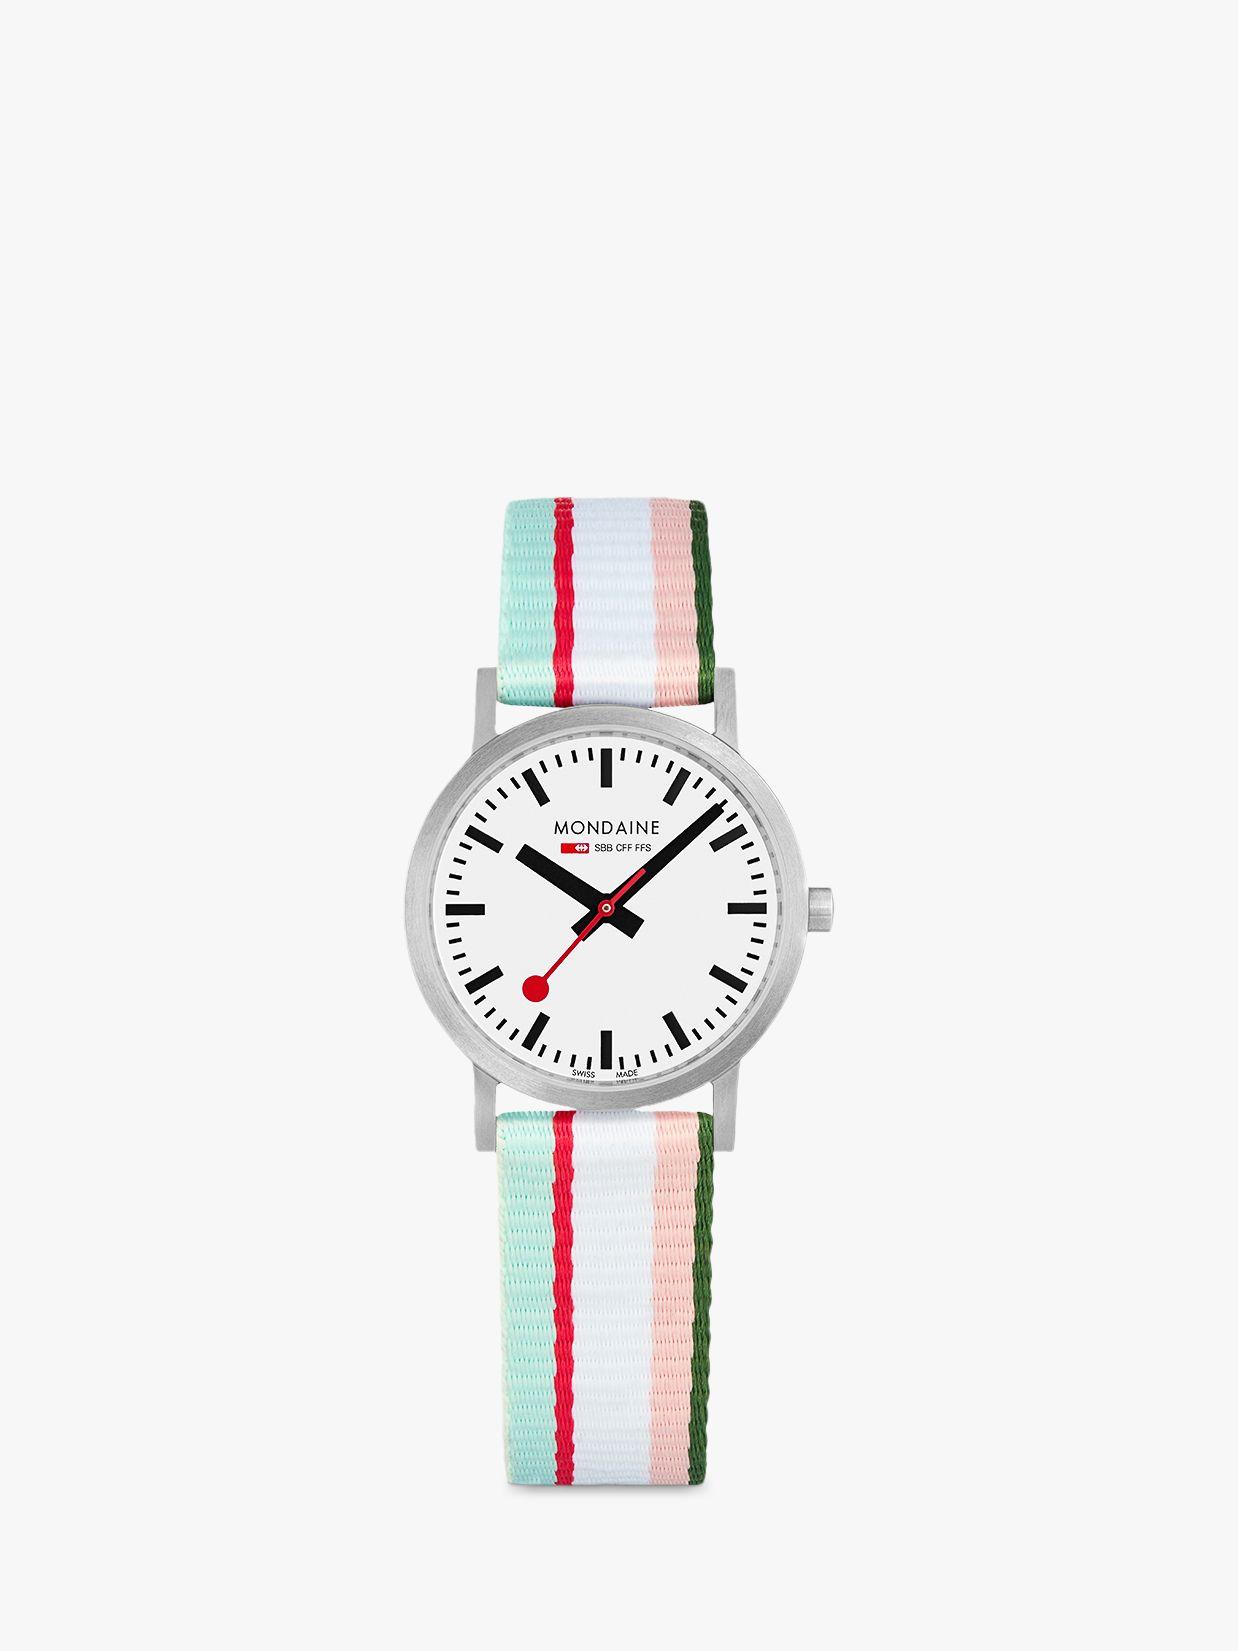 Mondaine Mondaine Women's SBB Classic Fabric Strap Watch